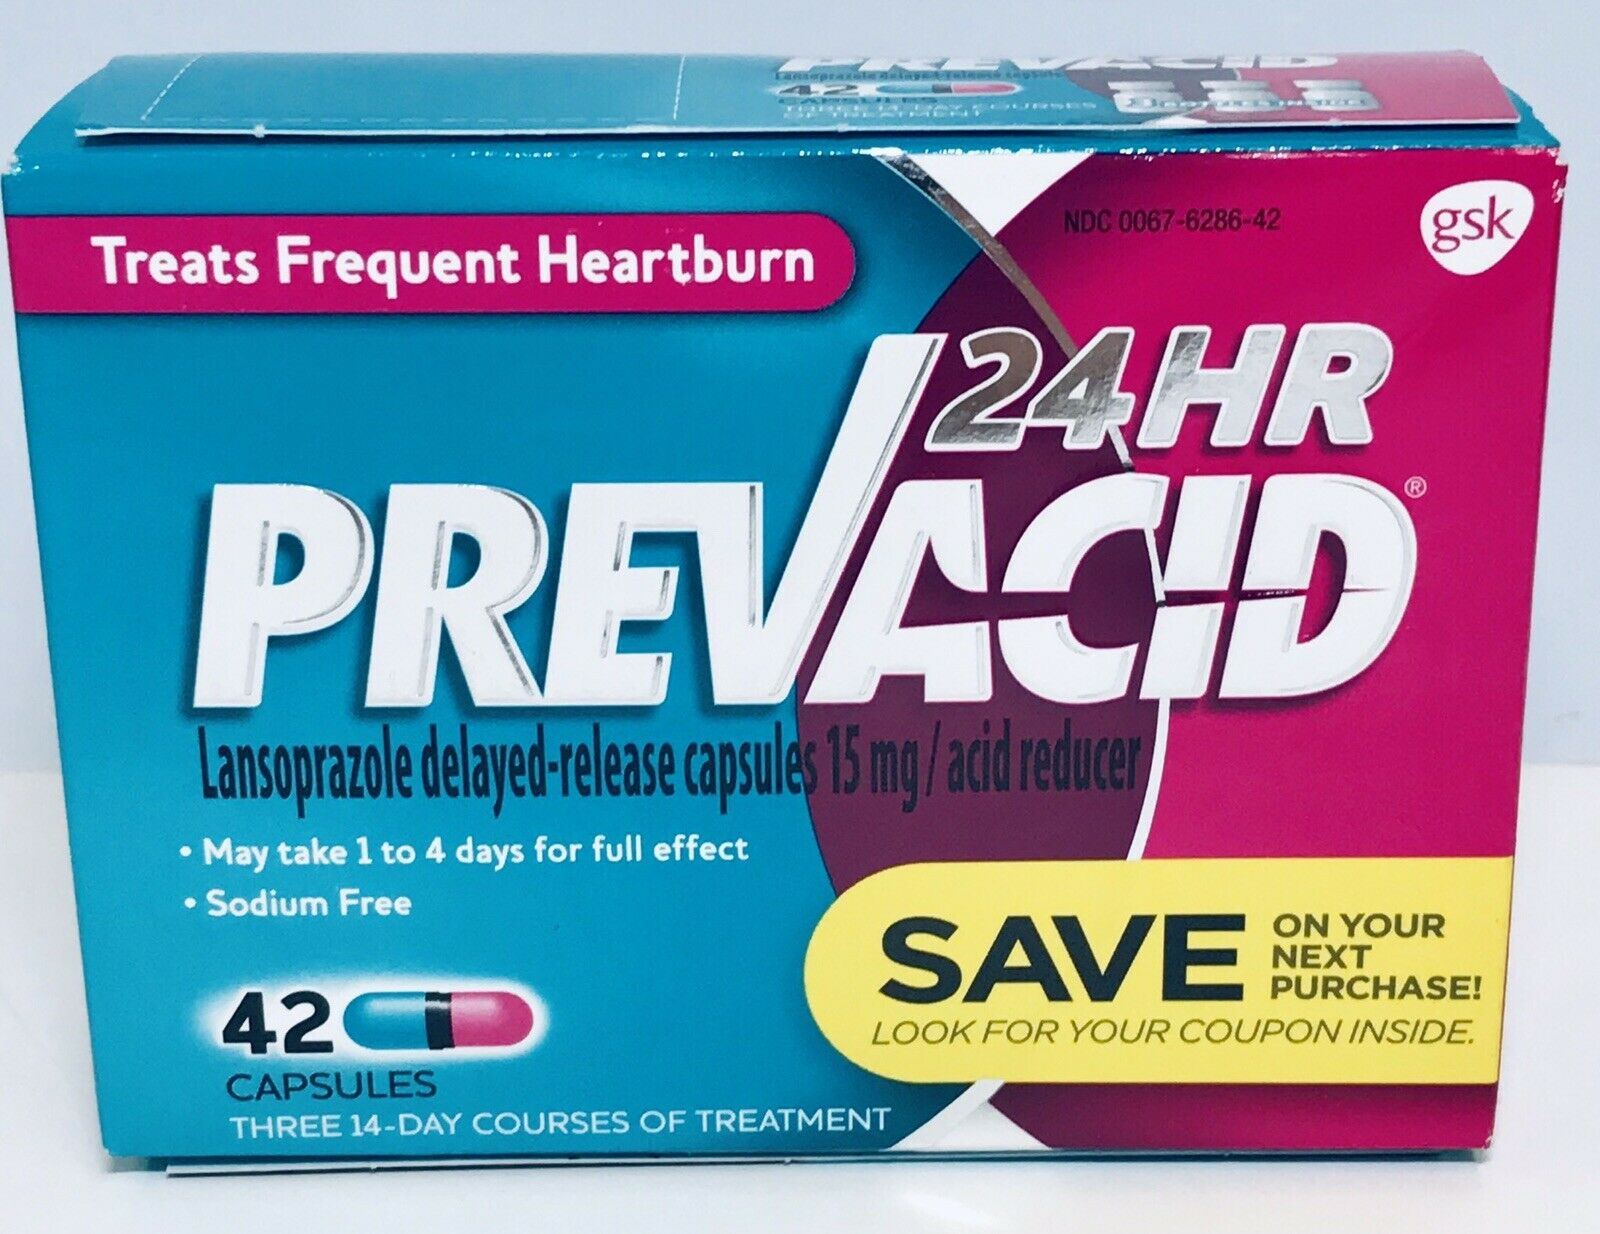 Prevacid 24 Hr Treats Frequent Heartburn  42 Capsules Exp 2020+ (6426) 1